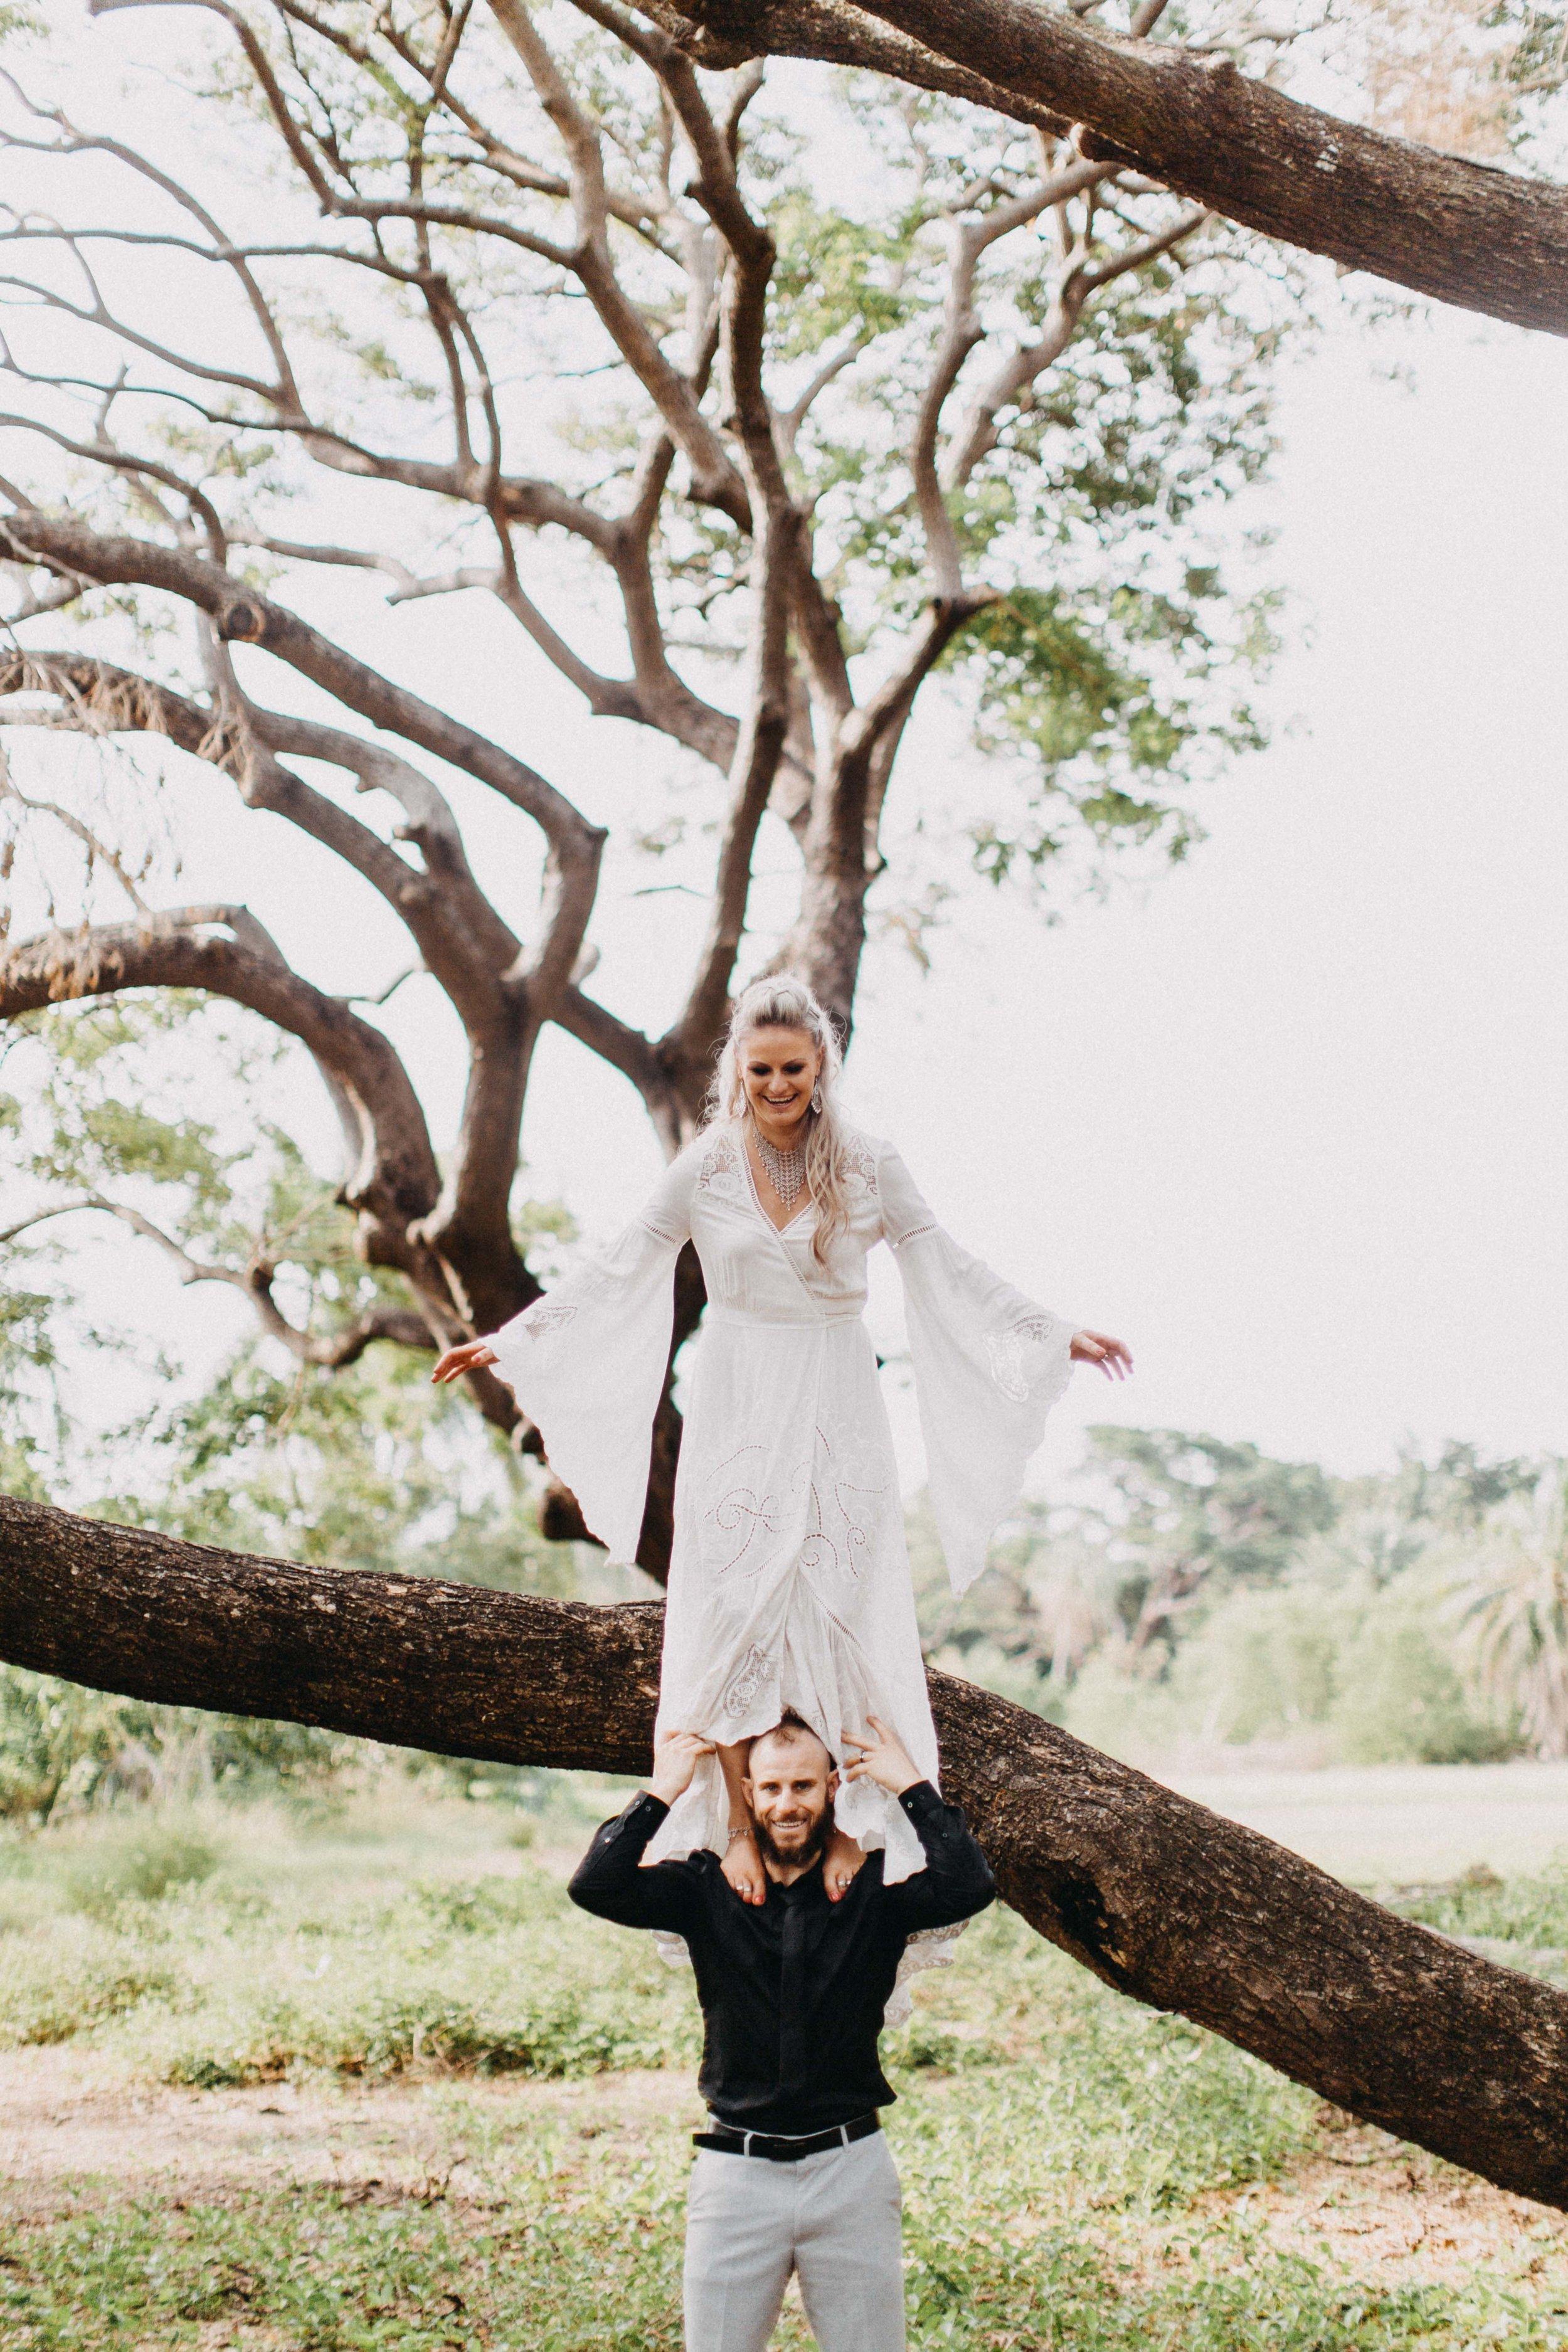 darwin-elopement-wedding-beach-camden-photography-www.emilyobrienphotography.net-41.jpg